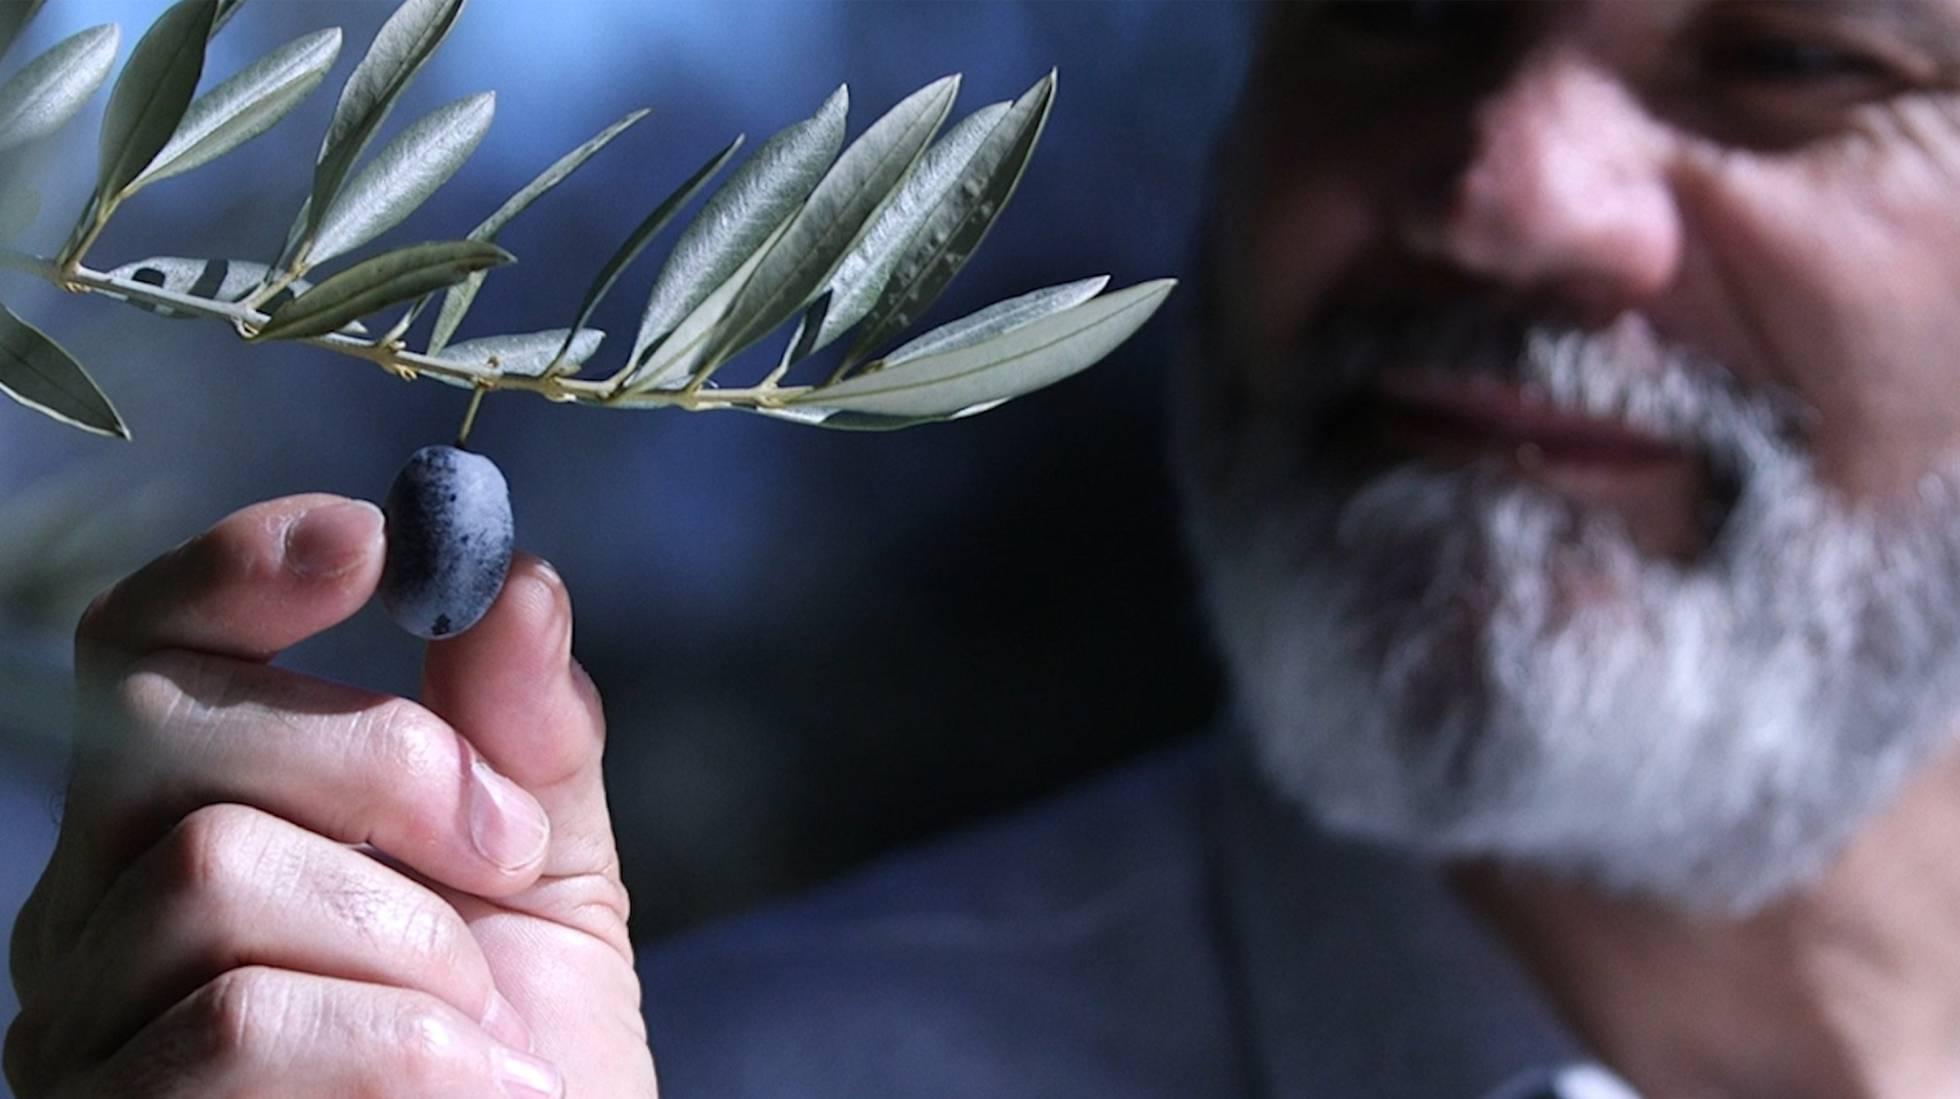 España: diseñan aceitunas de silicona para atrapar a ladrones de cosechas